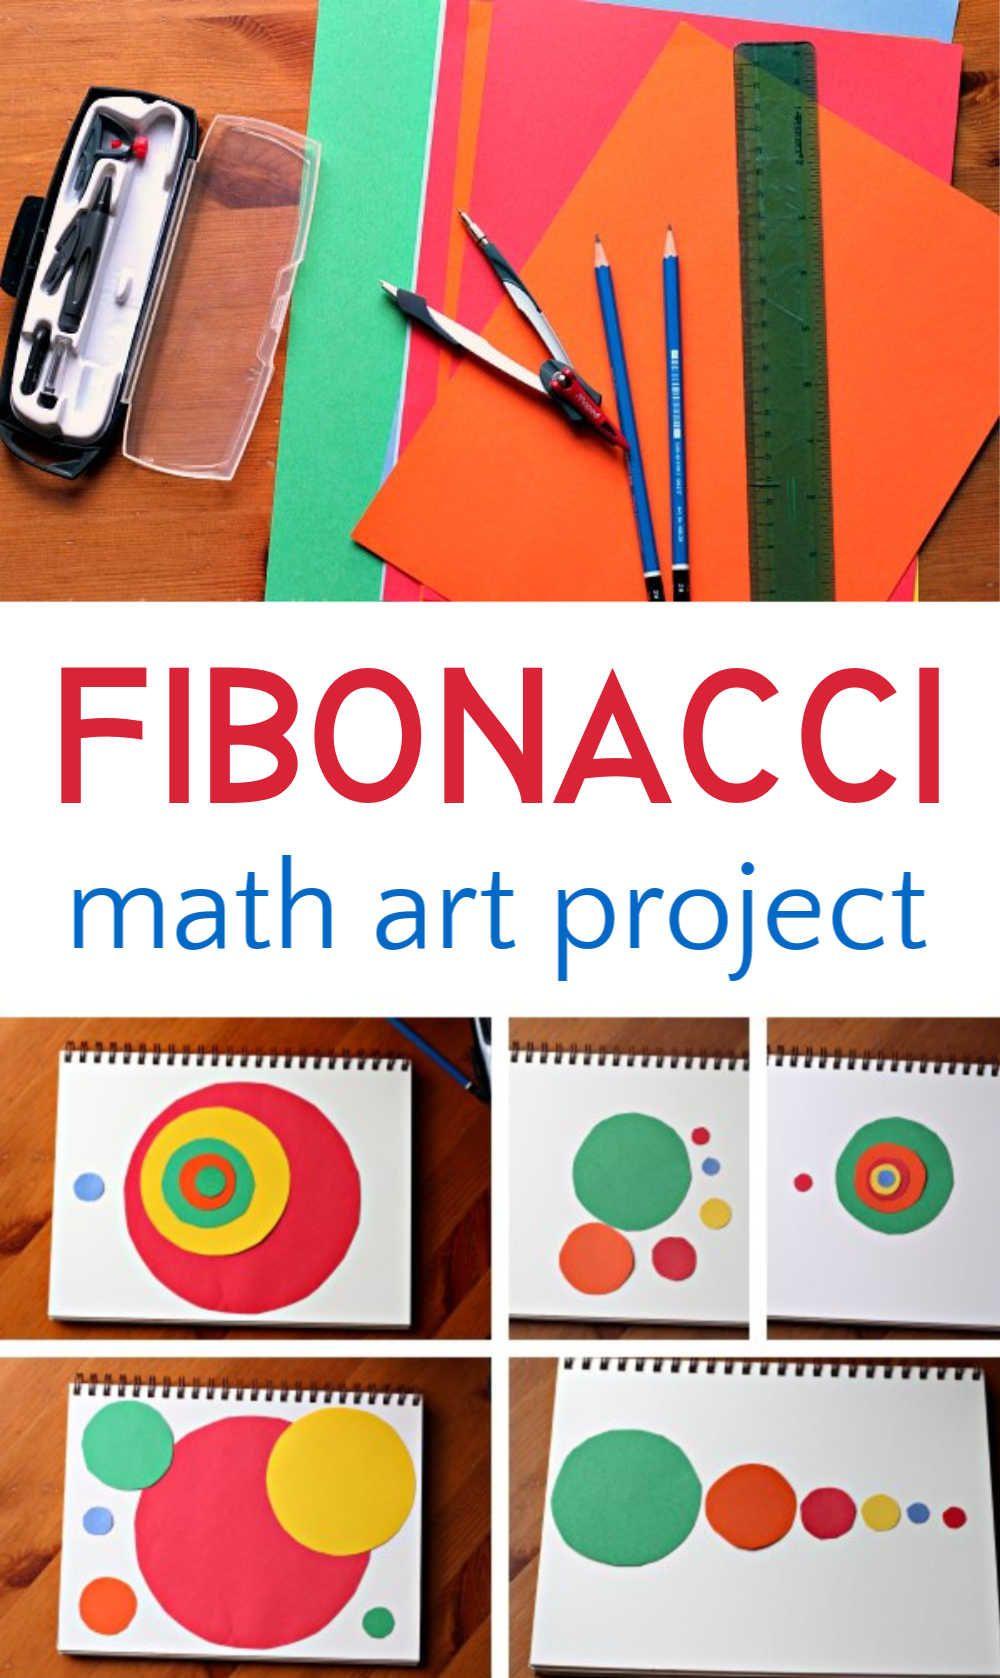 Cool fibonacci art project for exploring the intersection between math and art, and the golden spiral. #mathart #artproject